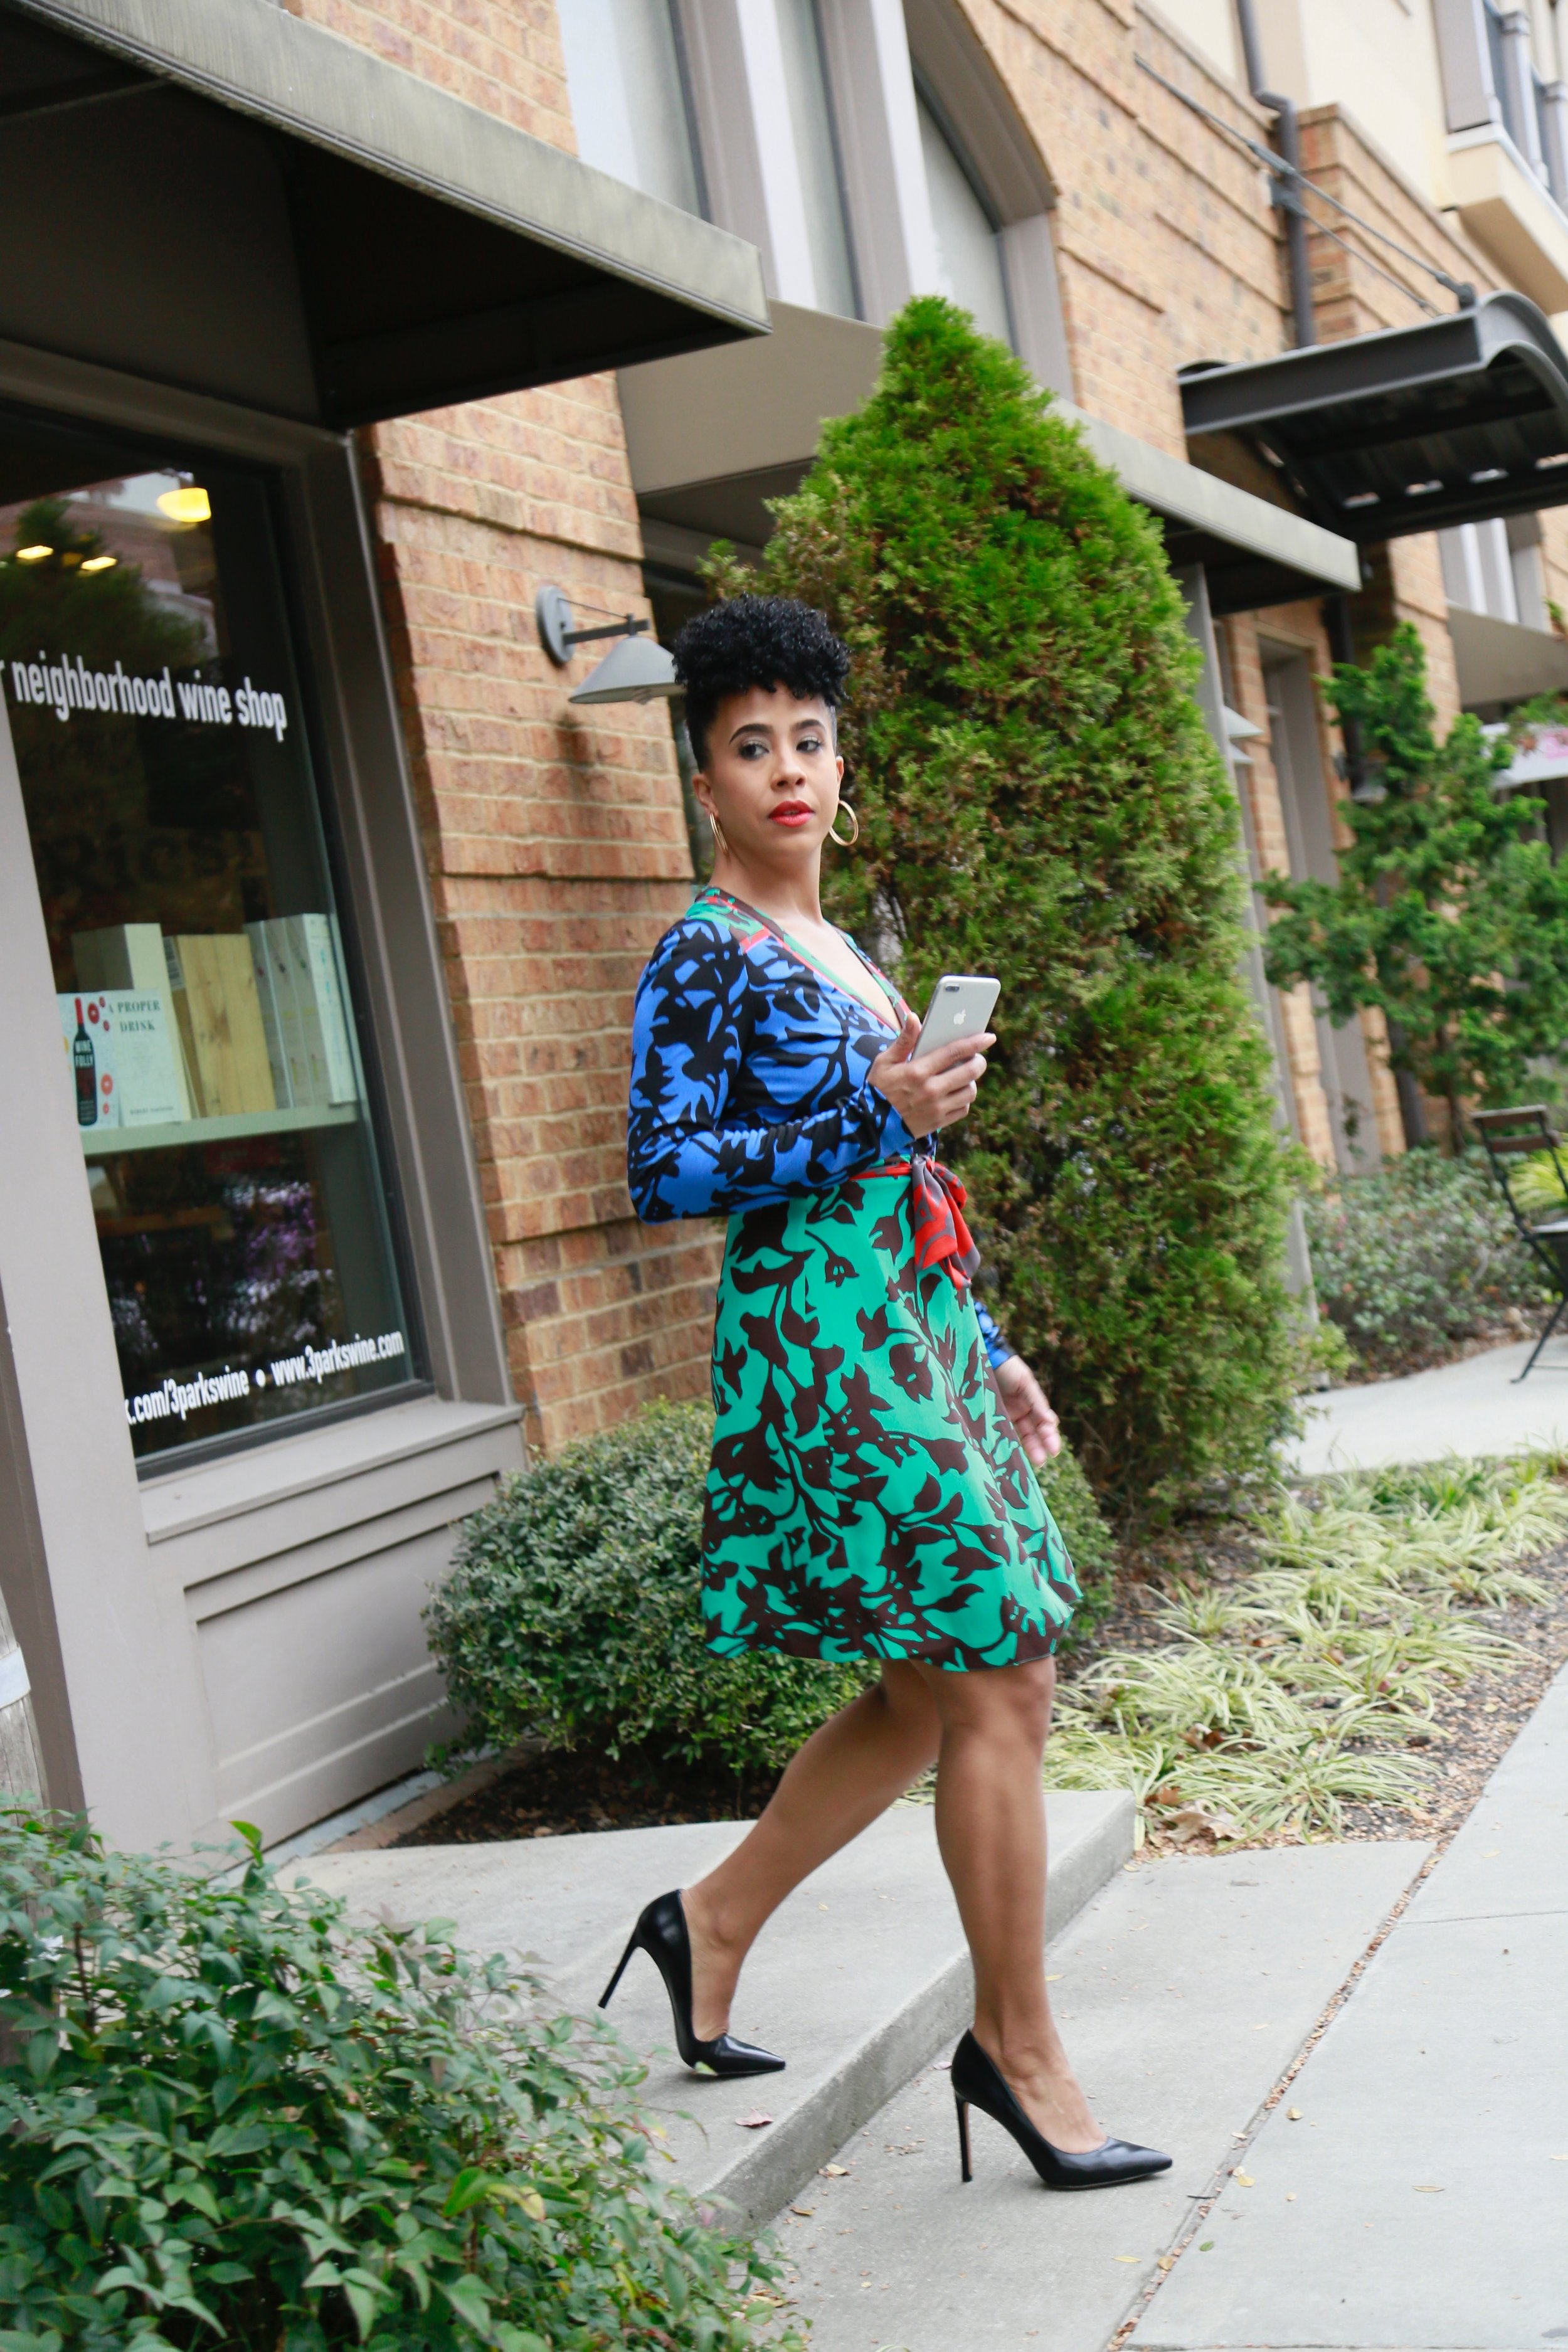 Dress:  Rent the Runway/DVF $80.00    Shoes:  Nine West $89.00